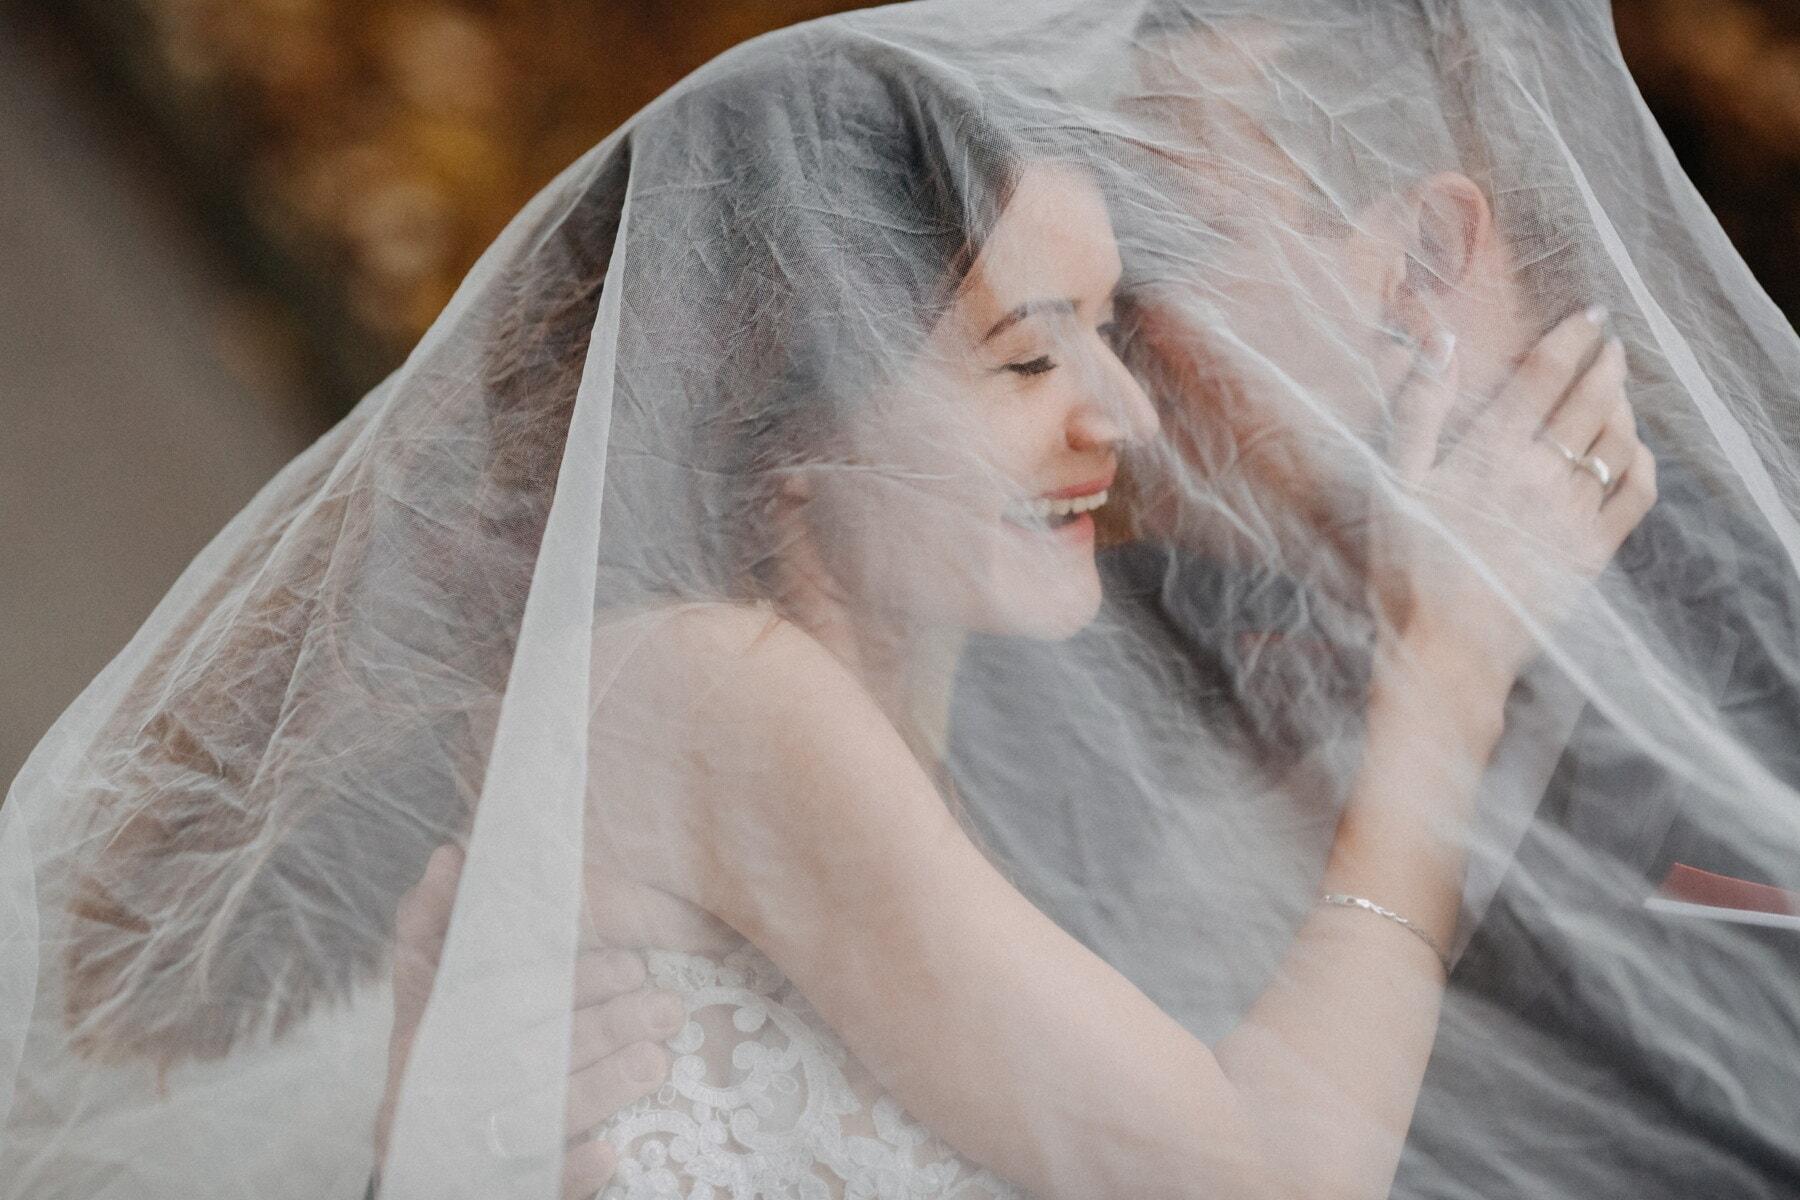 mariage, mariage, blonde, jeune marié, voile, femme, la mariée, mode, jeune fille, amour